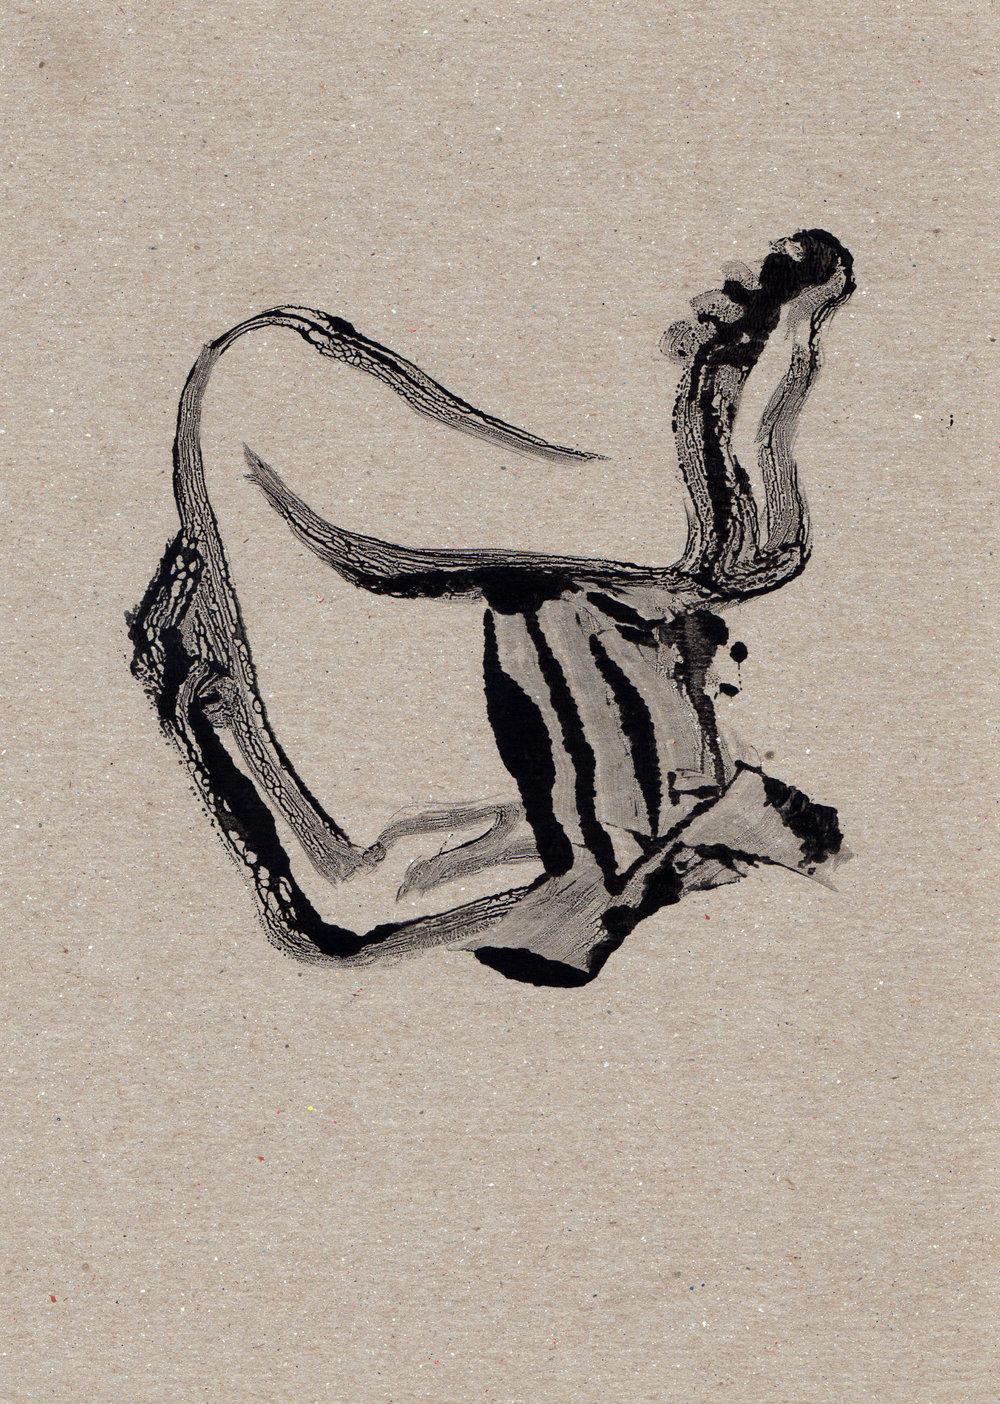 Untitled Wrestle, 2014, gelatin monotype, 11x8 inches